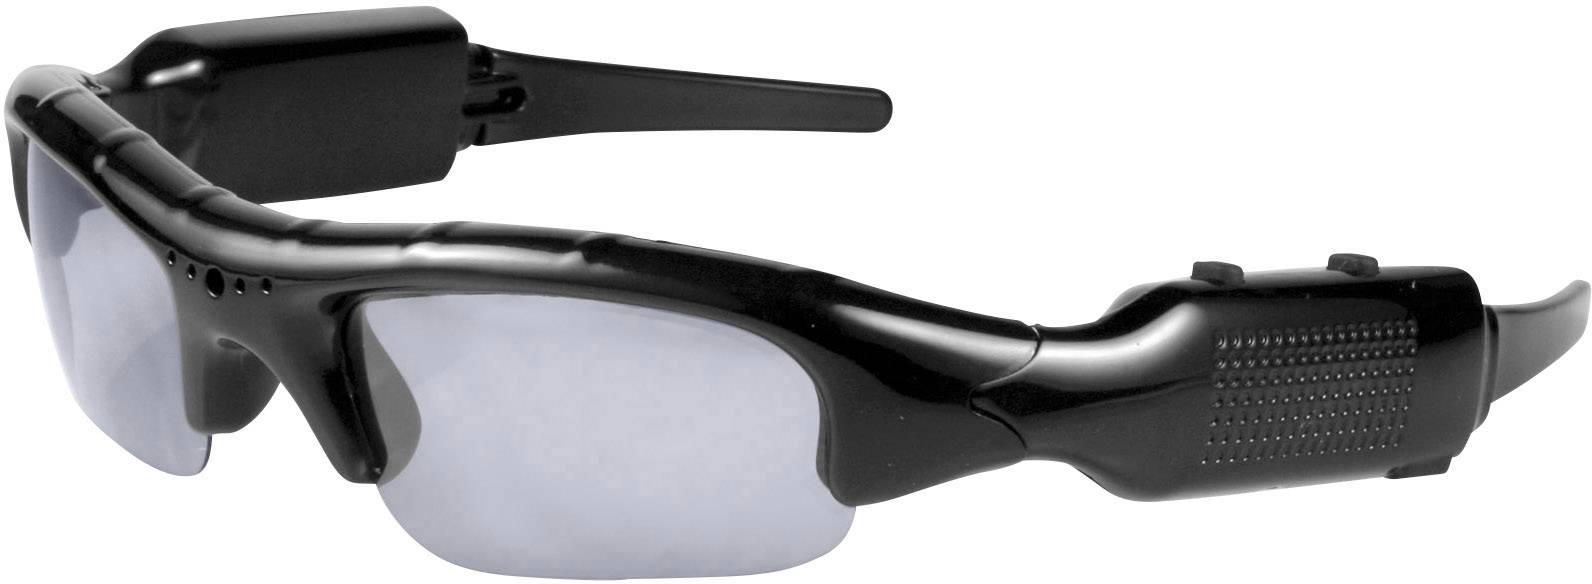 Športová kamera v okuliaroch Technaxx VGA 3591